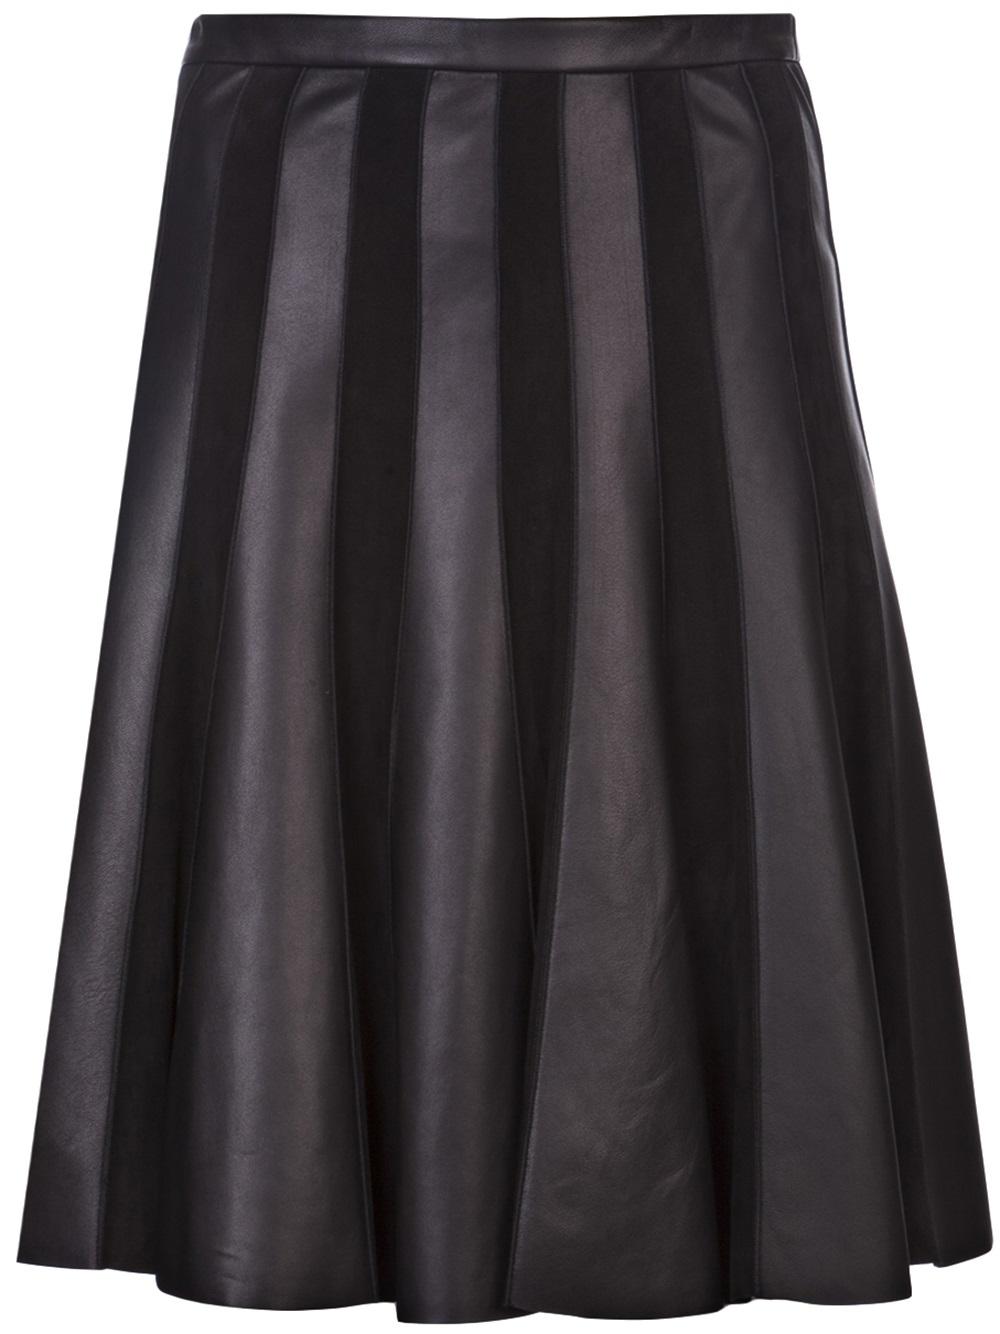 jason wu leather panel flare skirt in black lyst